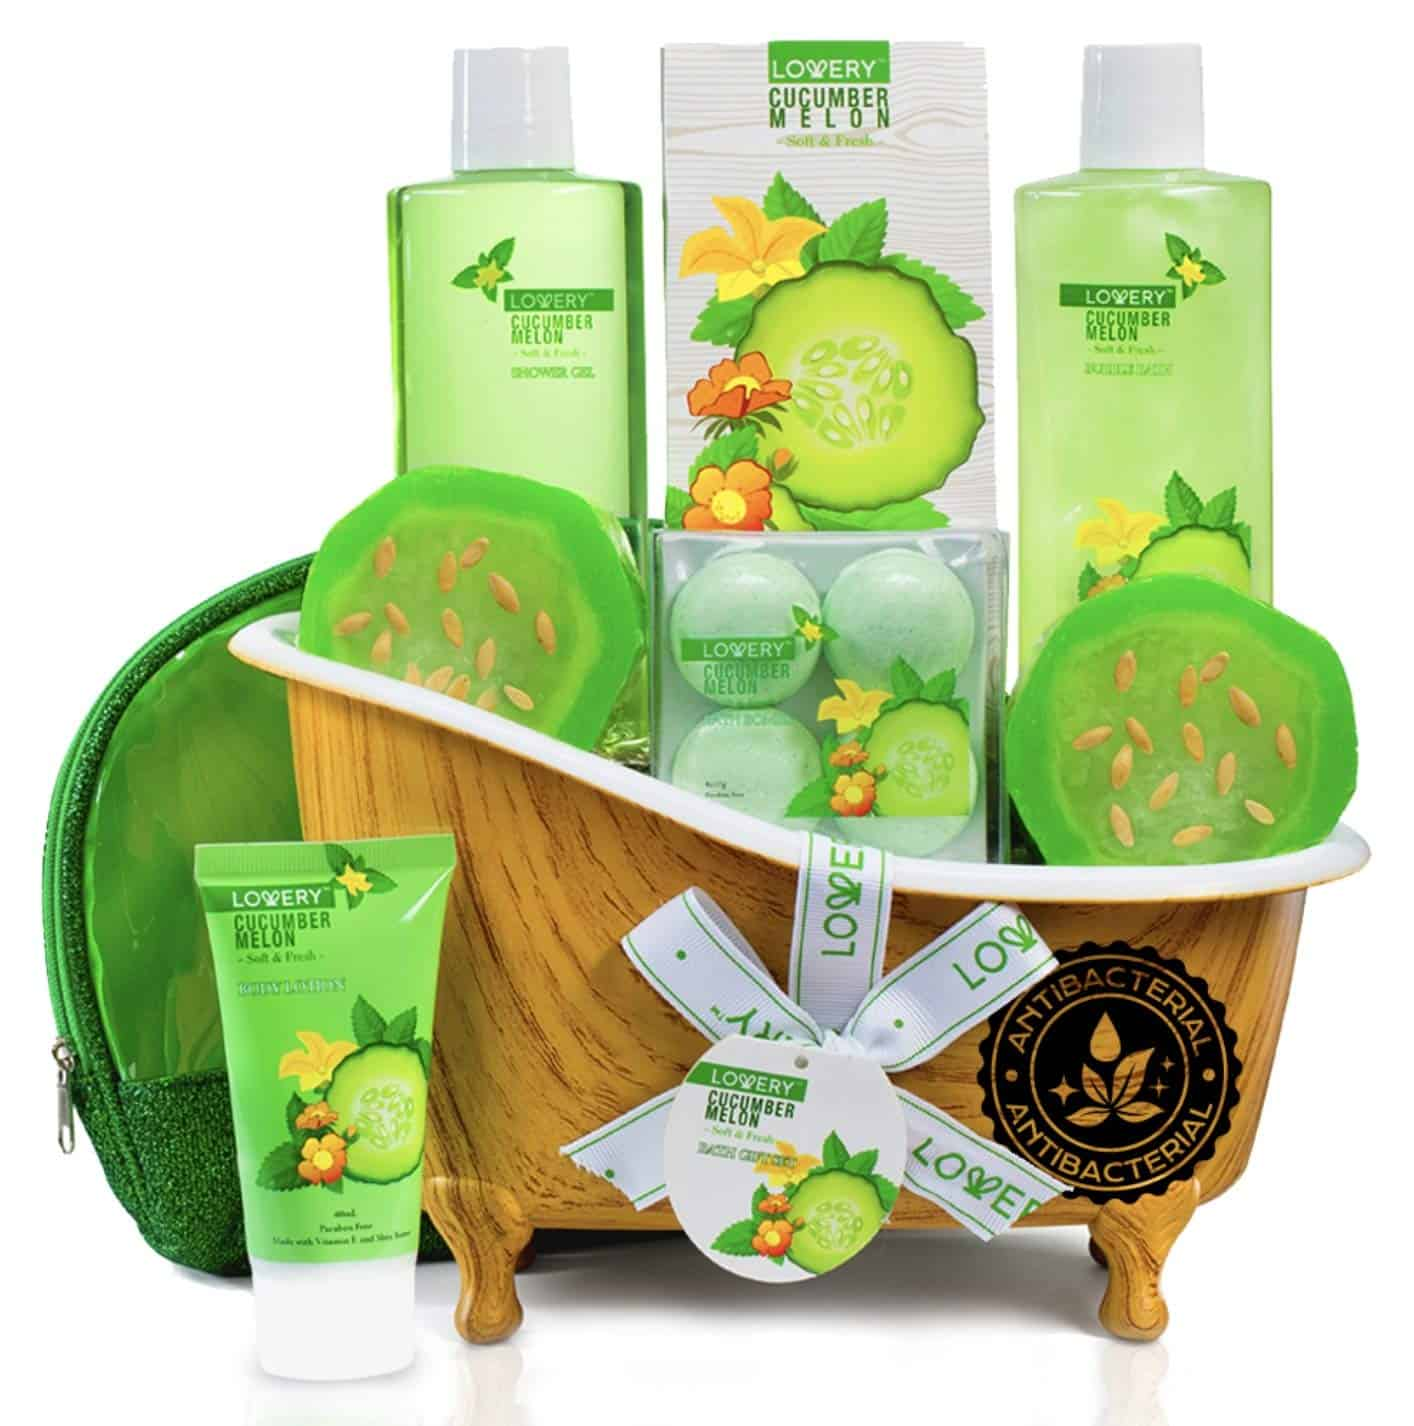 Spa bath basket gift - self care advice - self-care tips